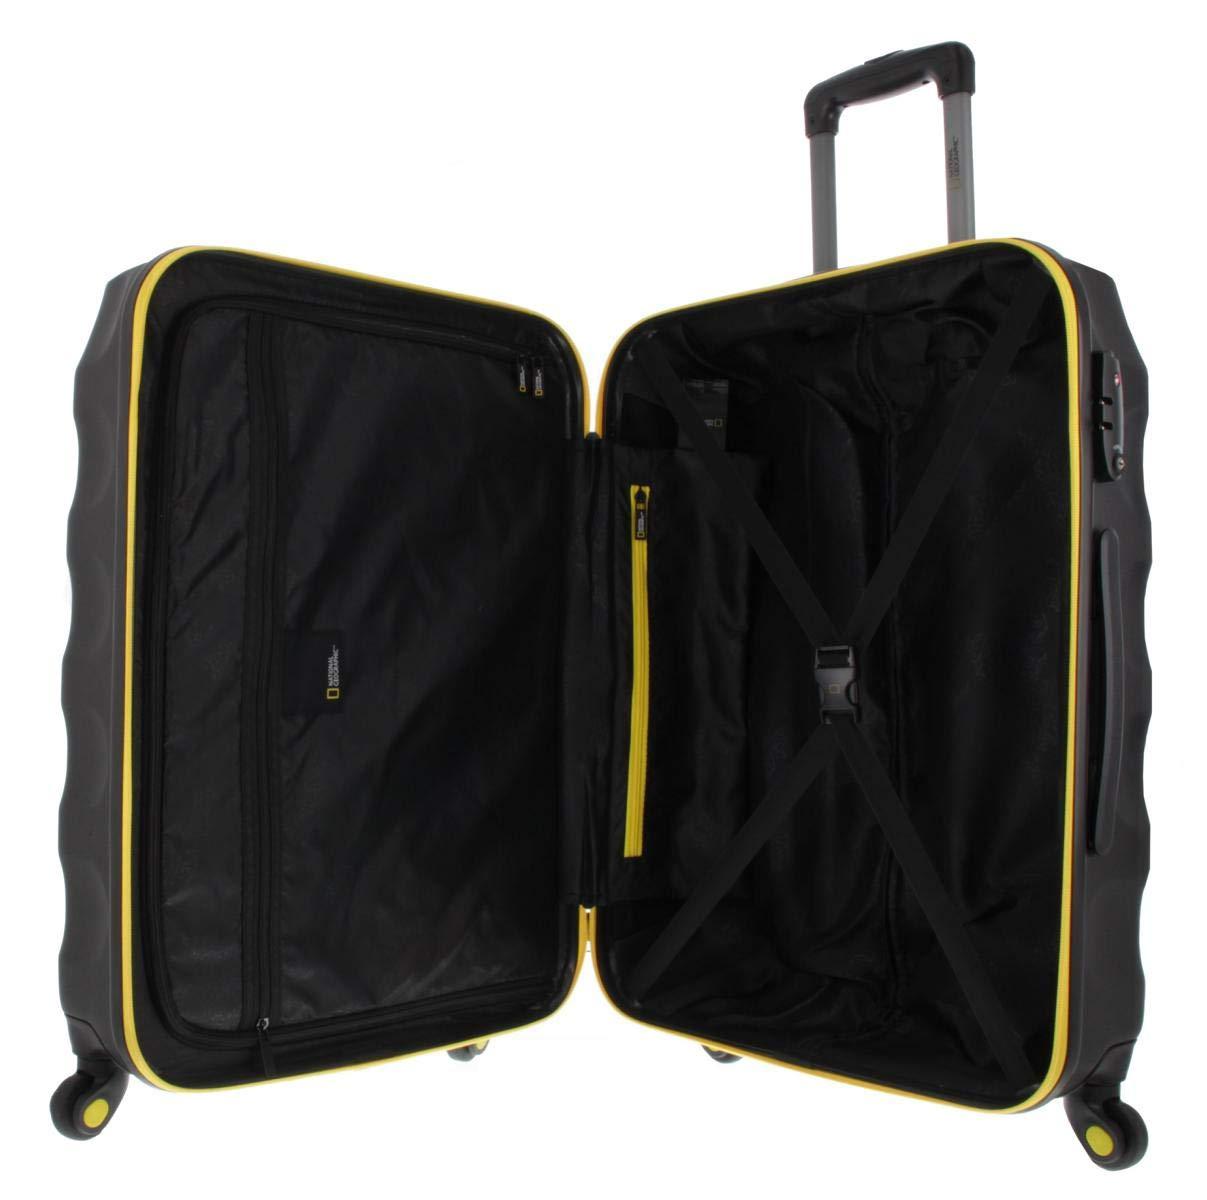 National-Geographic-Spinner-Koffer-4-Rollen-Zahlenschloss-Zoll-Gr-S-M-L-dreier-Set-Arete-Trolley